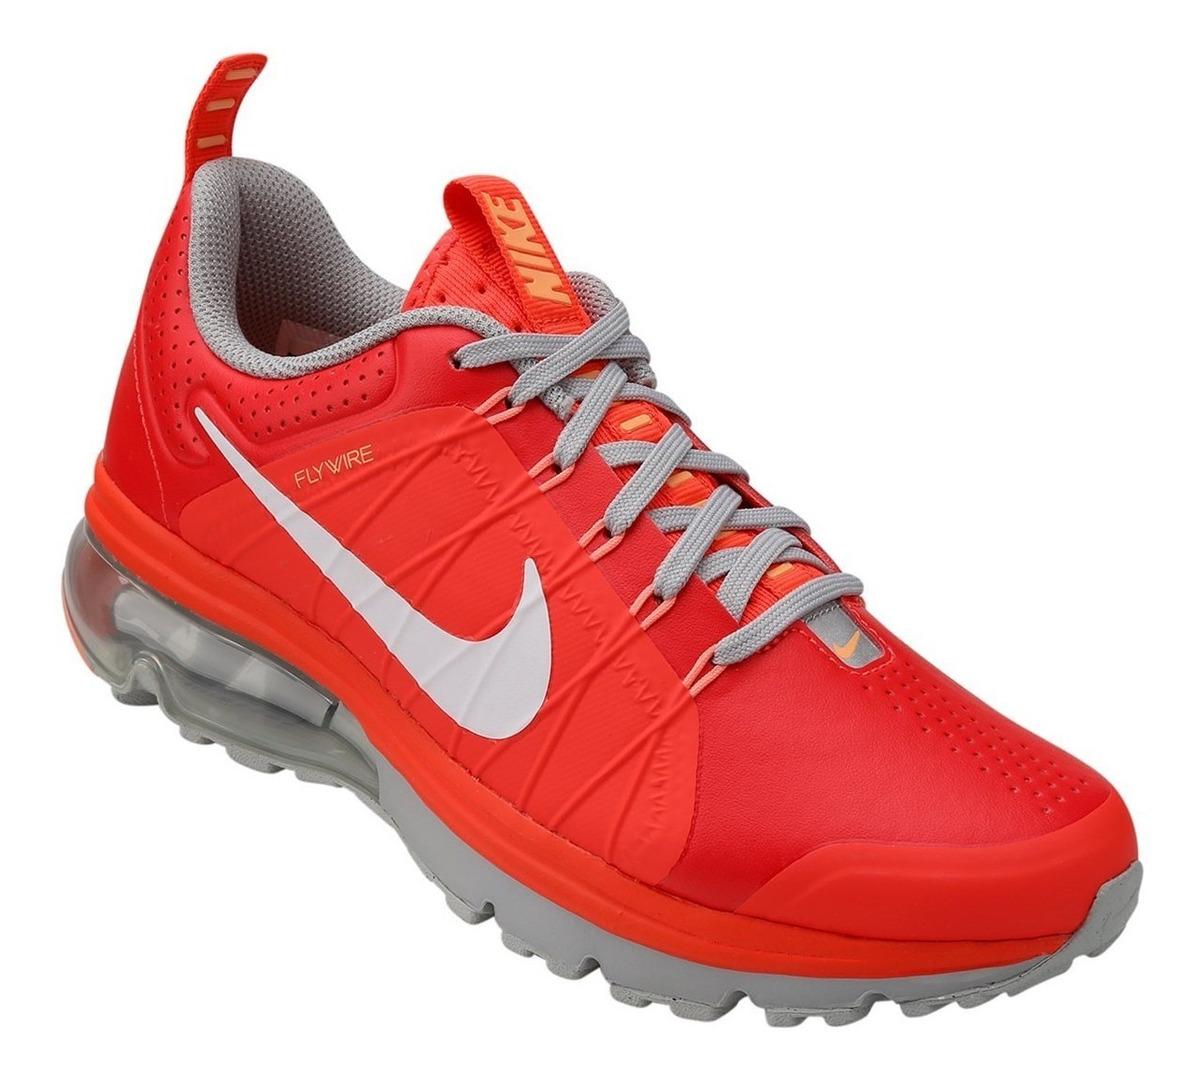 dirt cheap 100% high quality performance sportswear Tênis Nike Air Max Supreme 4 Vrm/lar Original